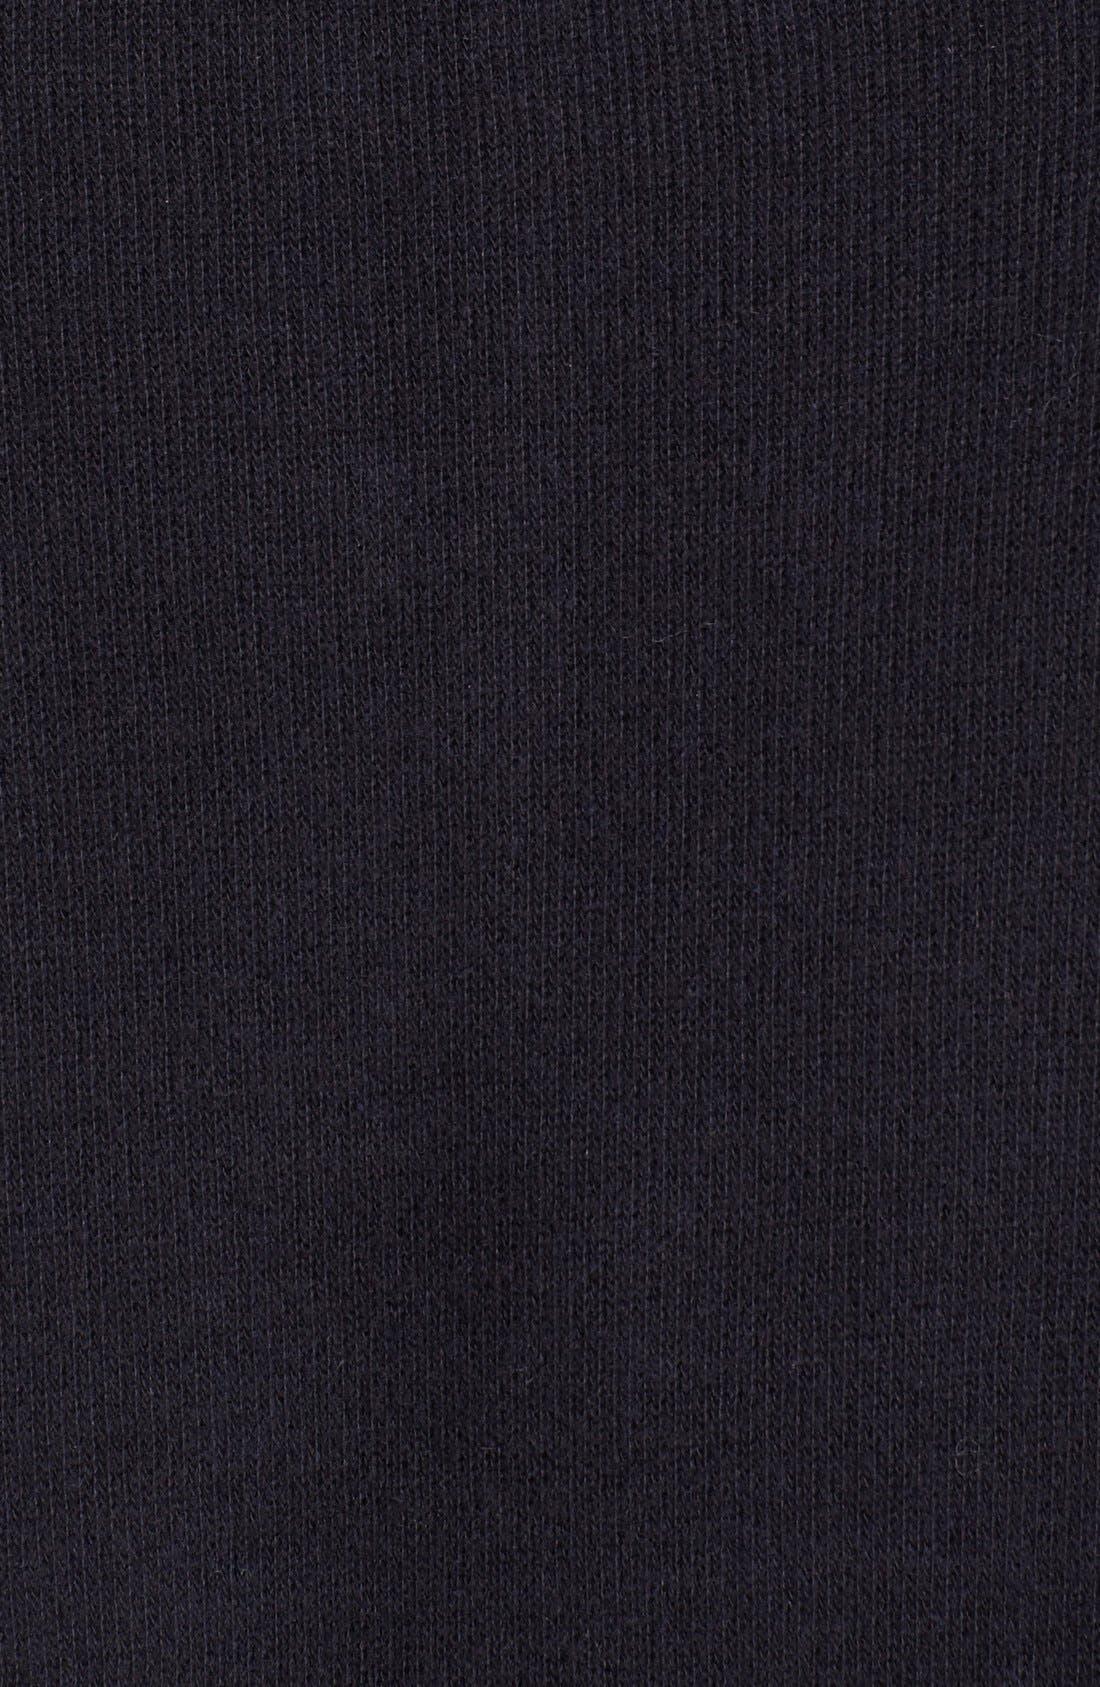 Alternate Image 4  - Tommy Bahama 'Flip Side Pro' Half Zip Pullover (Big & Tall)